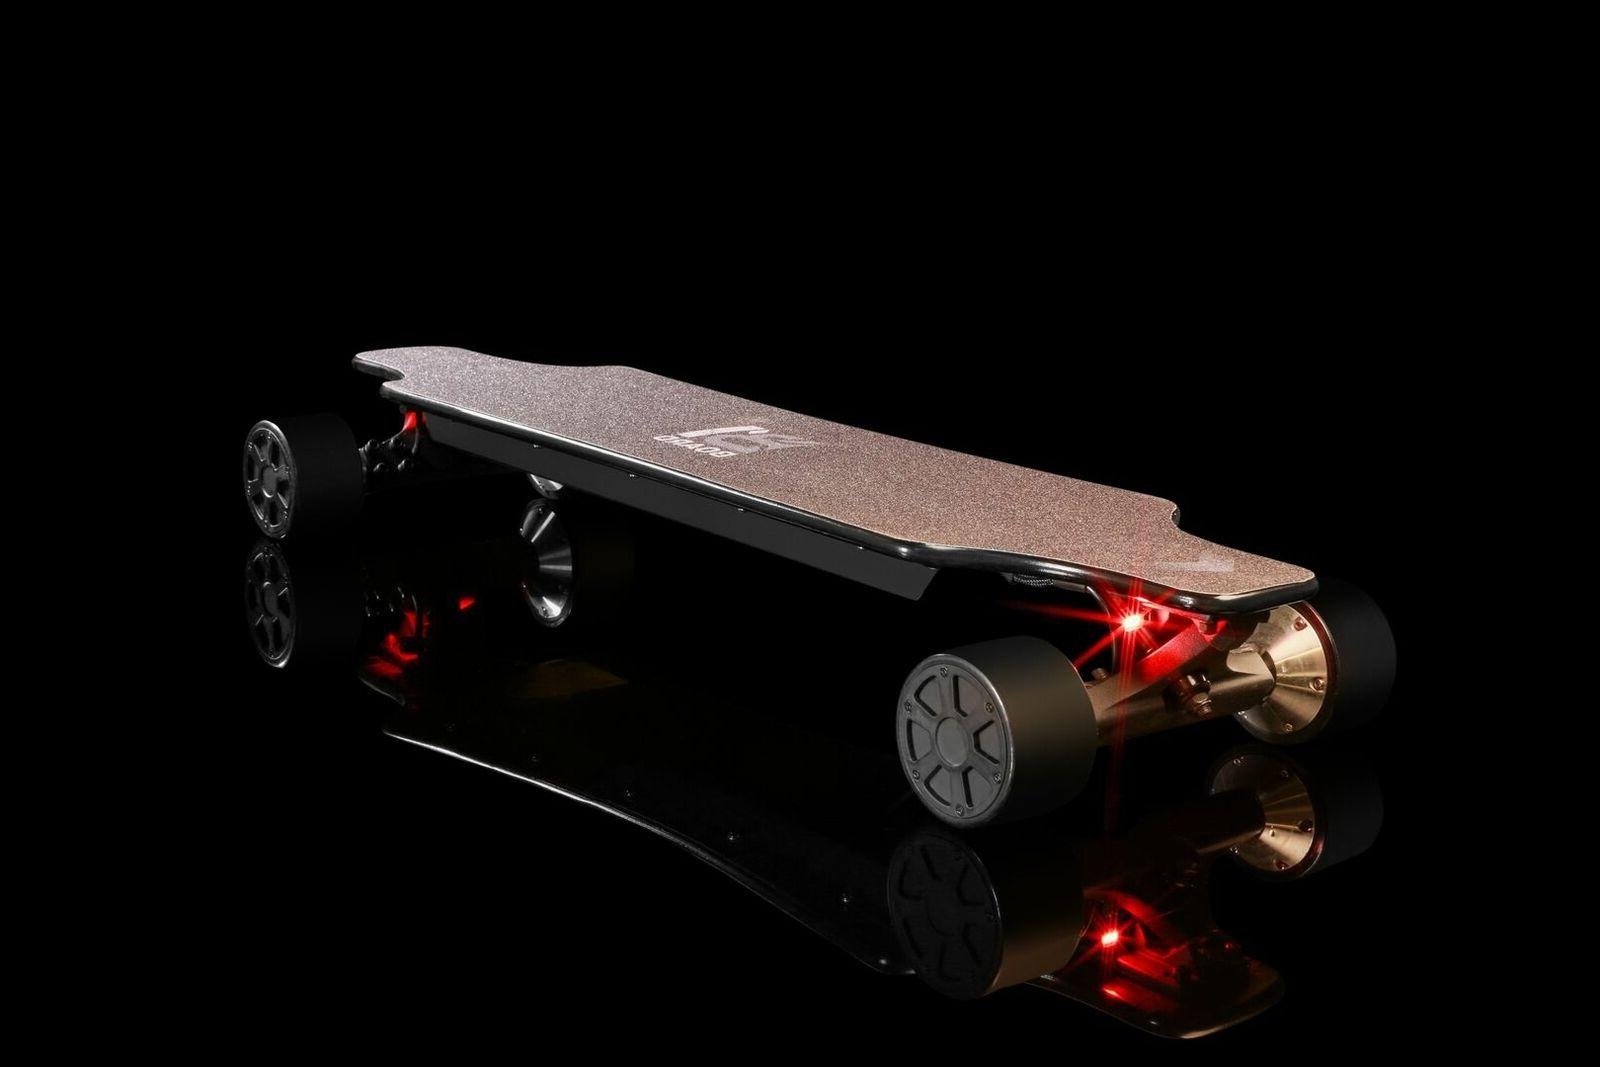 B1 BOARD-G5-Electric Skateboard-4WD-3600W-25MPH-18mi Range-w